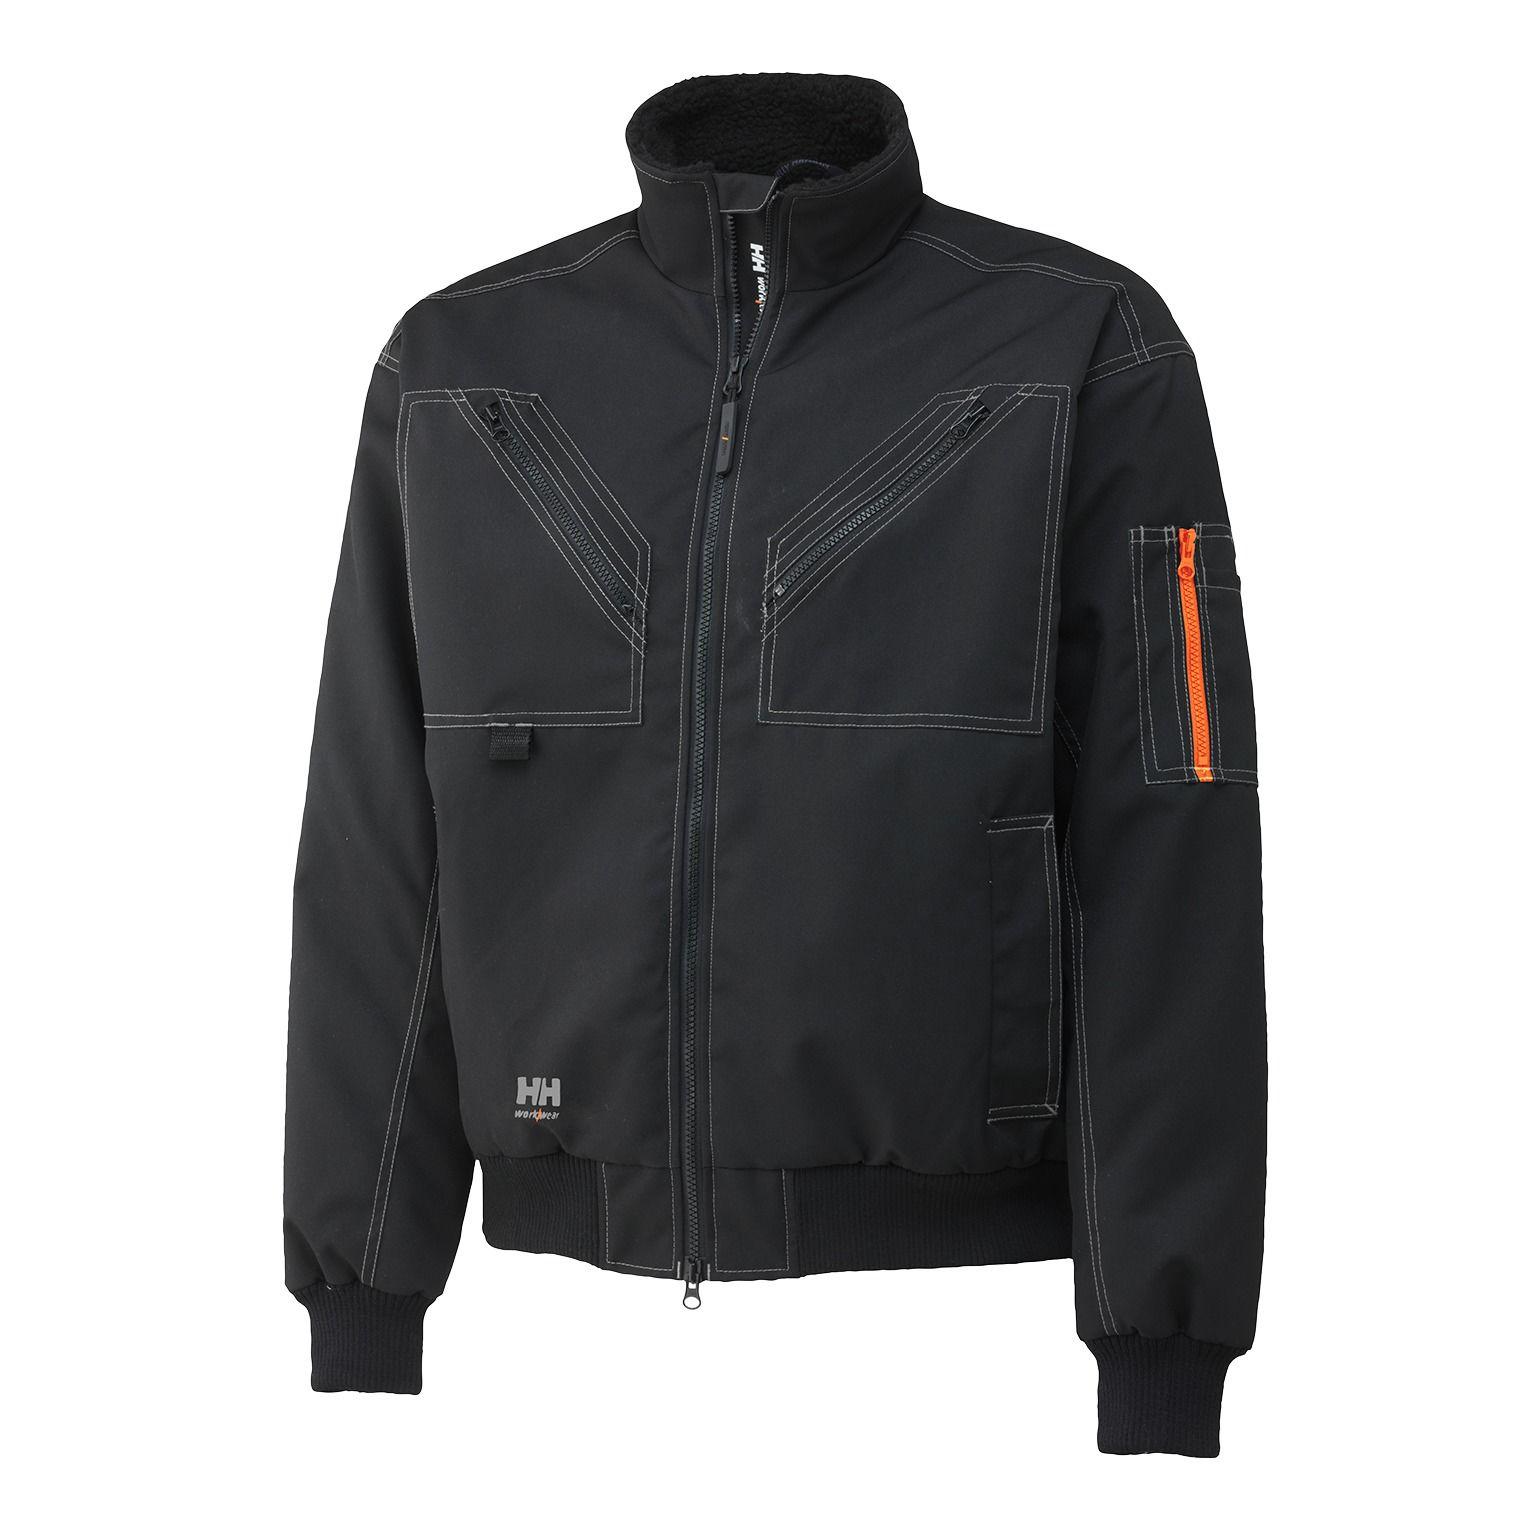 20d15747 Bergholm Winter Work Jacket - Helly Hansen 76211 — iWantWorkwear